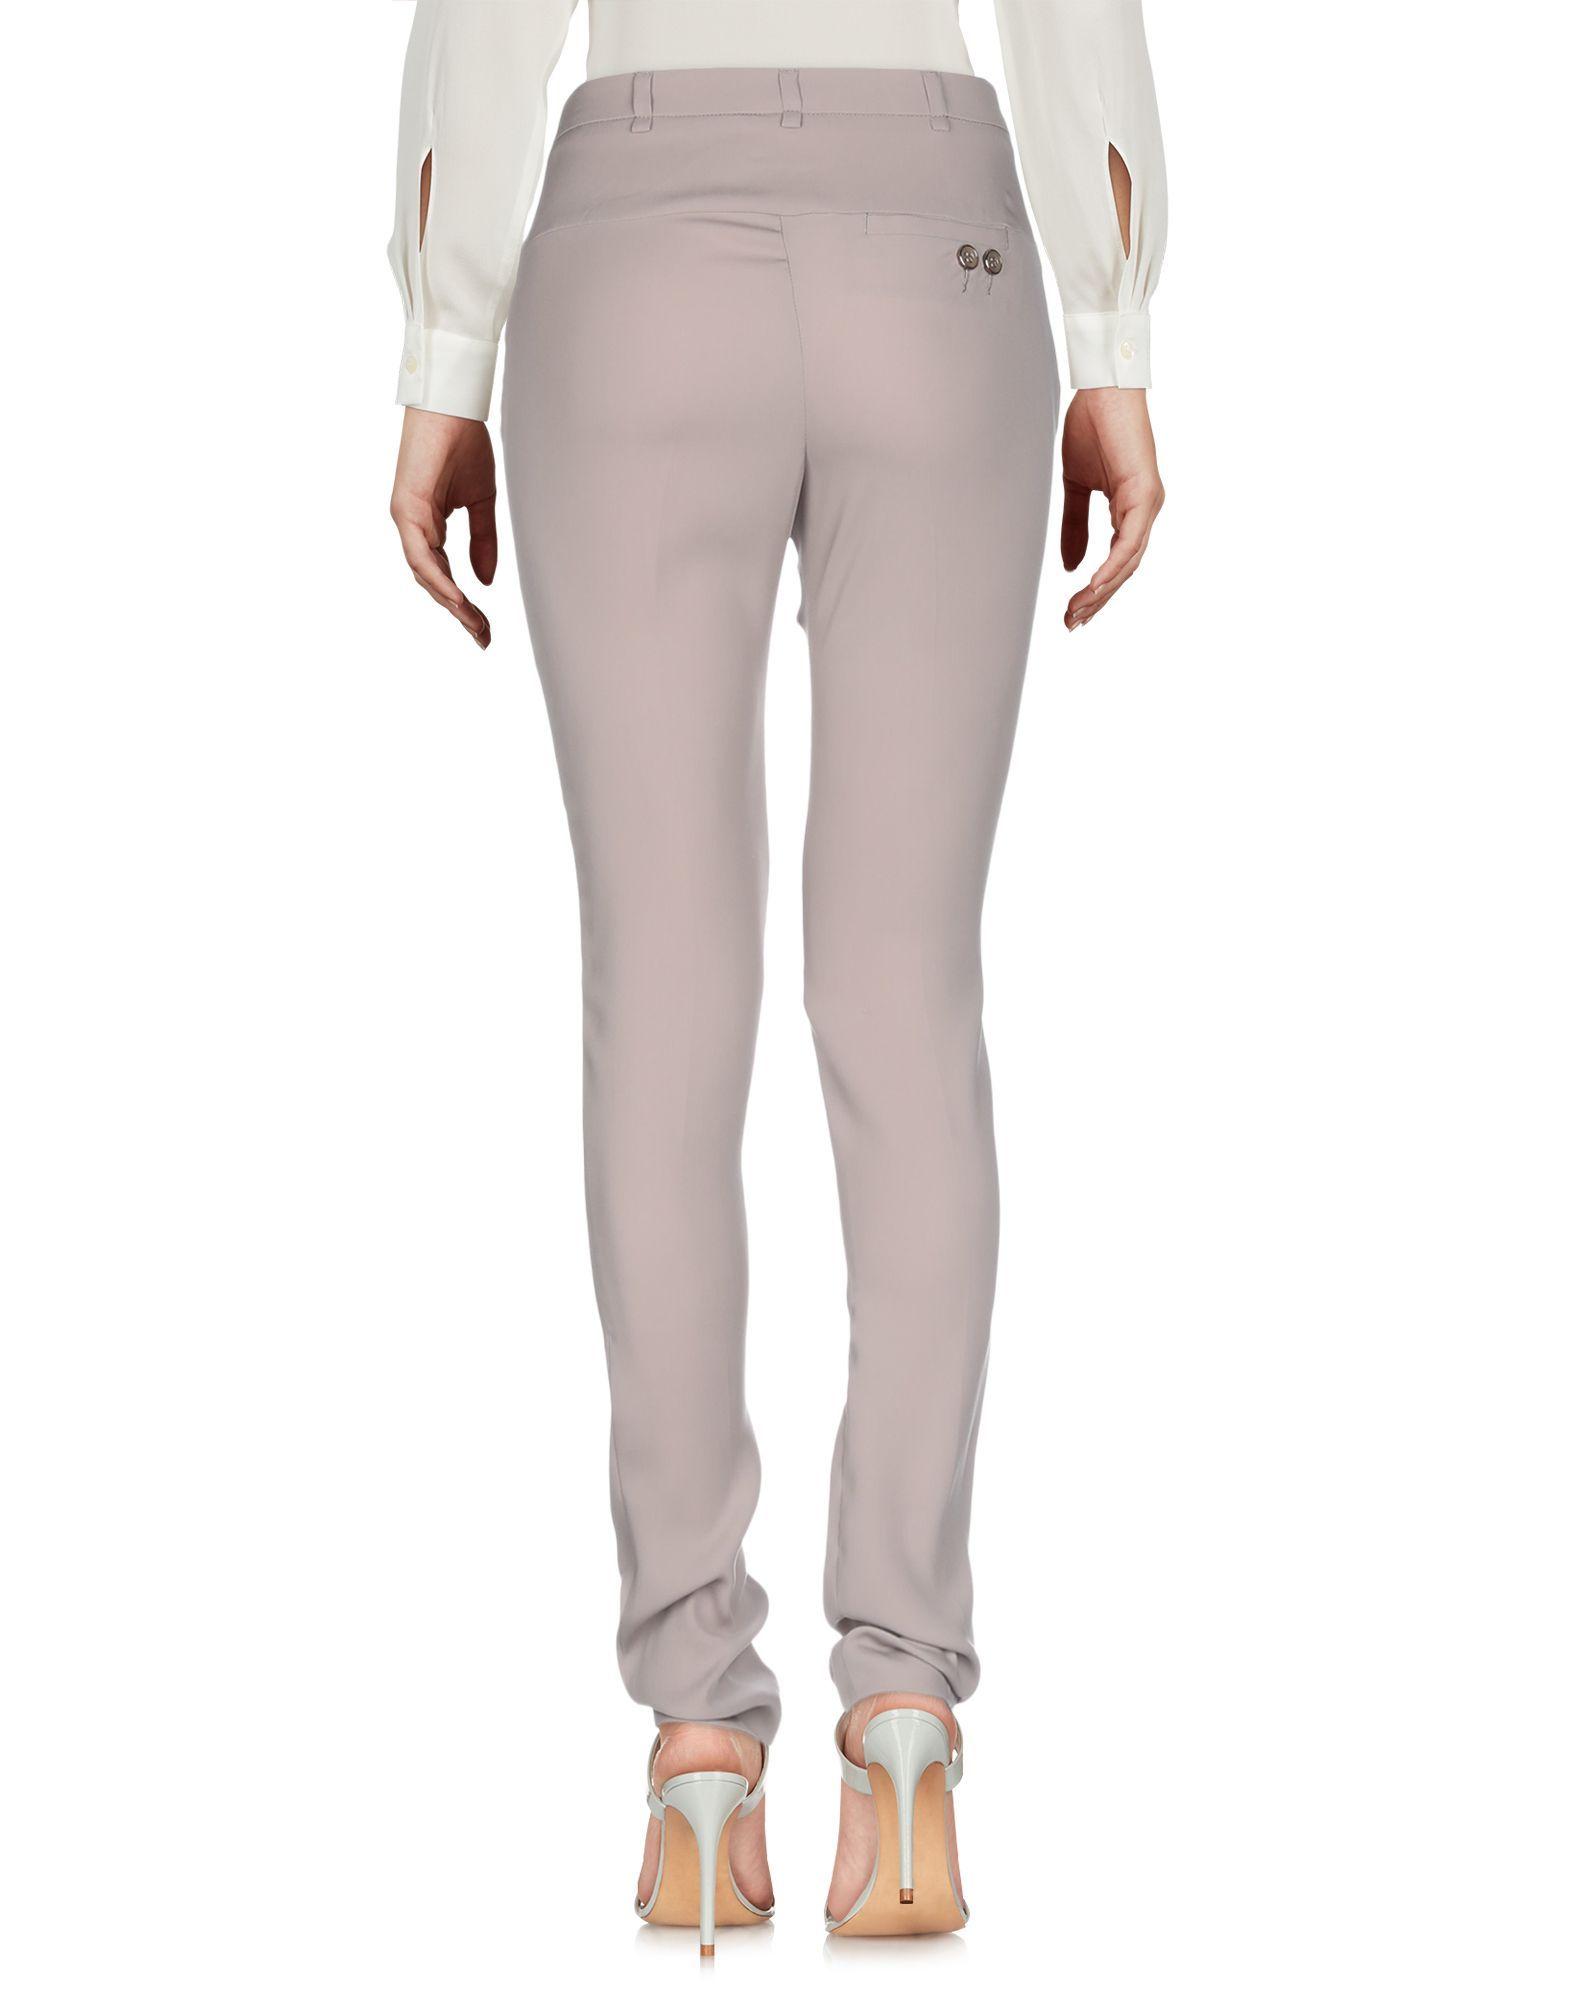 Liu Jo Grey Trousers